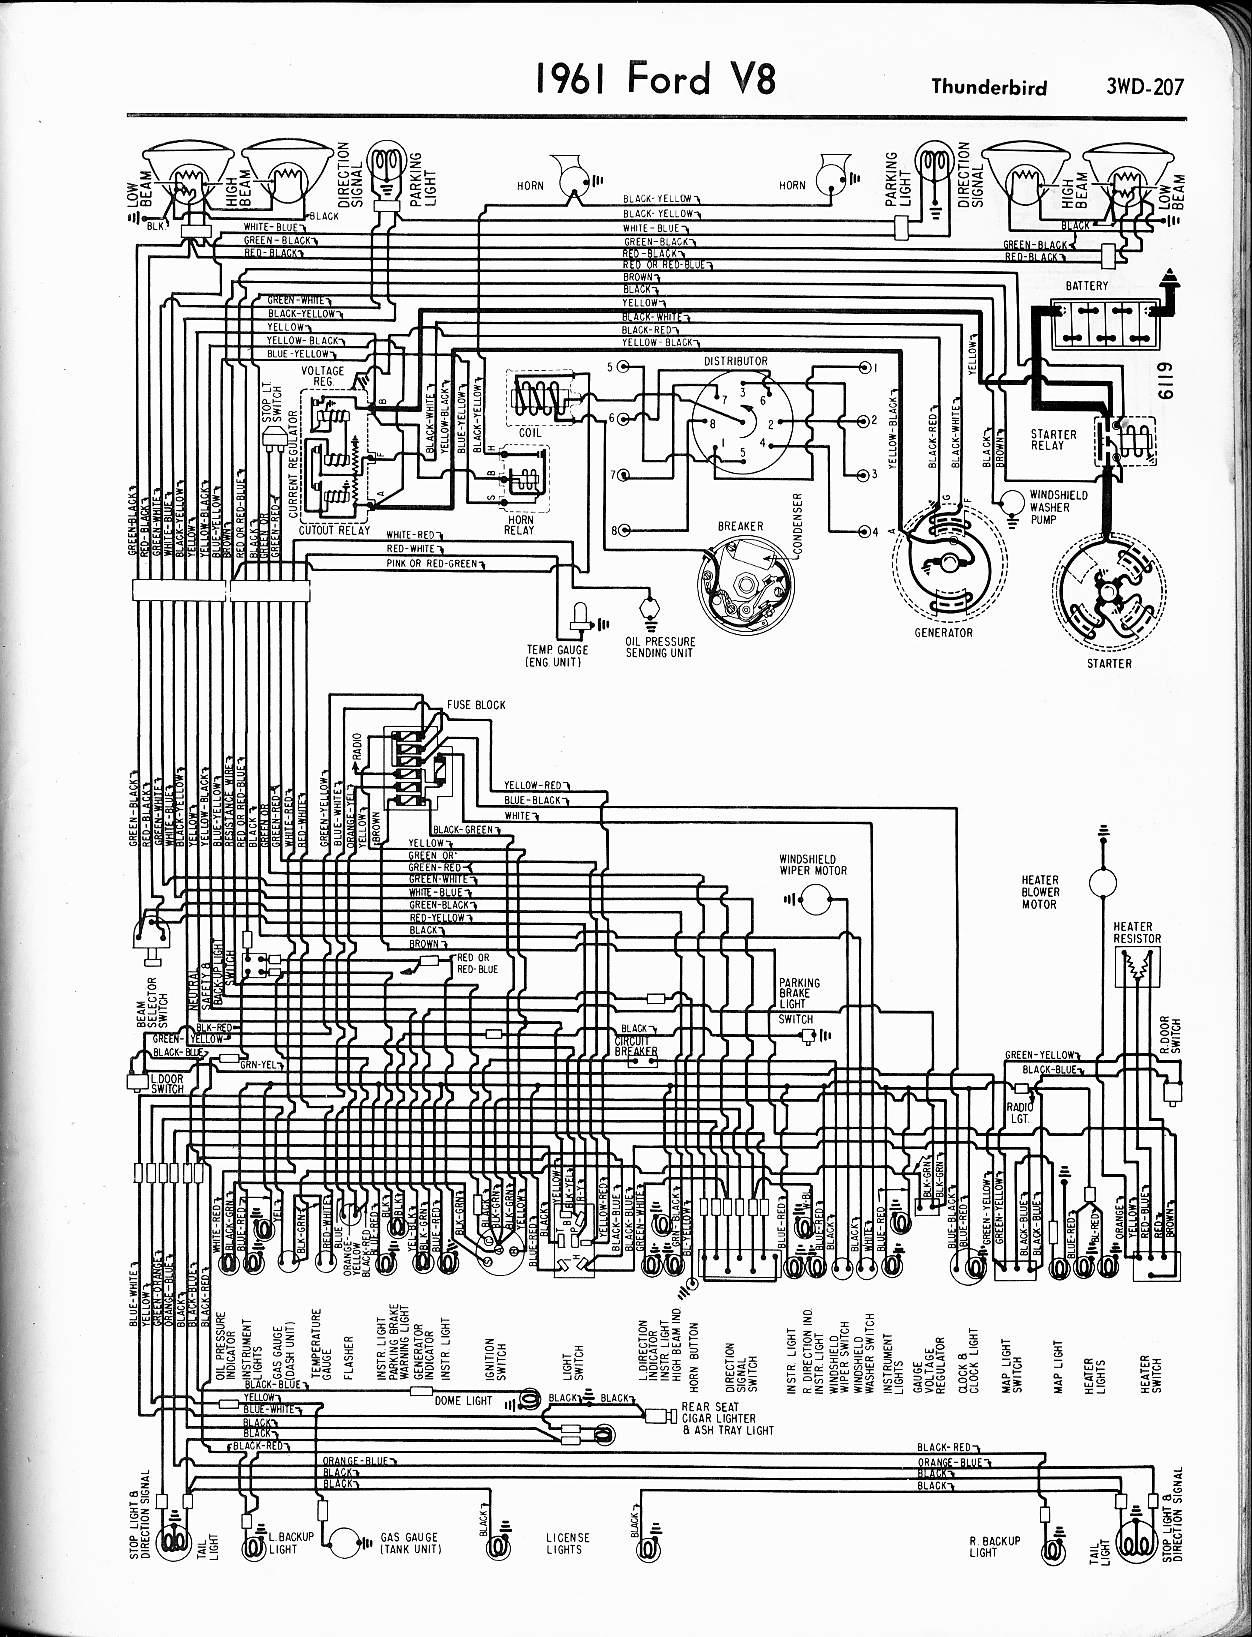 1956 corvette wiring diagram ao 9117  1956 mercury fuse box free diagram  ao 9117  1956 mercury fuse box free diagram